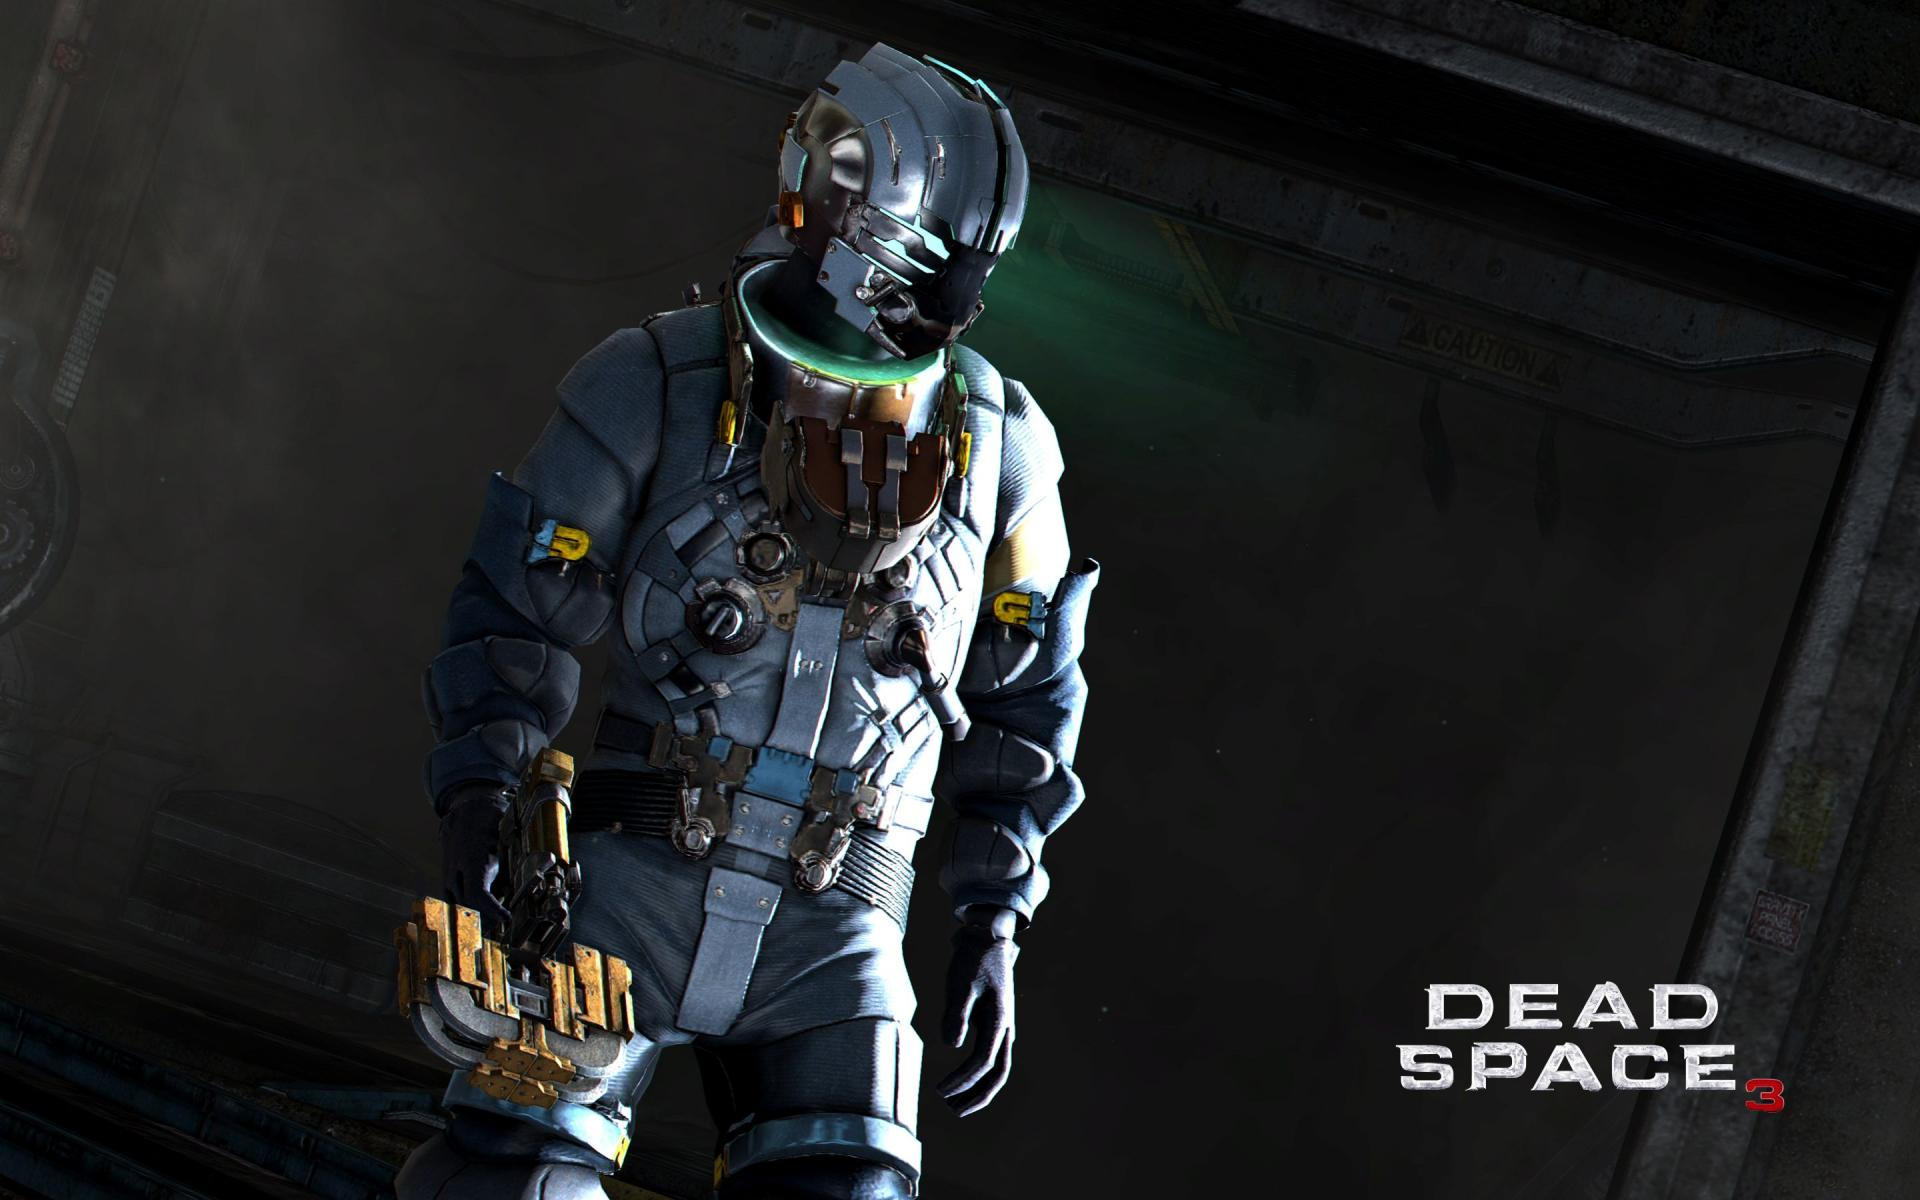 Dead space game wallpaper full hd desktop wallpapers 1080p - Dead space 3 wallpaper 1080p ...